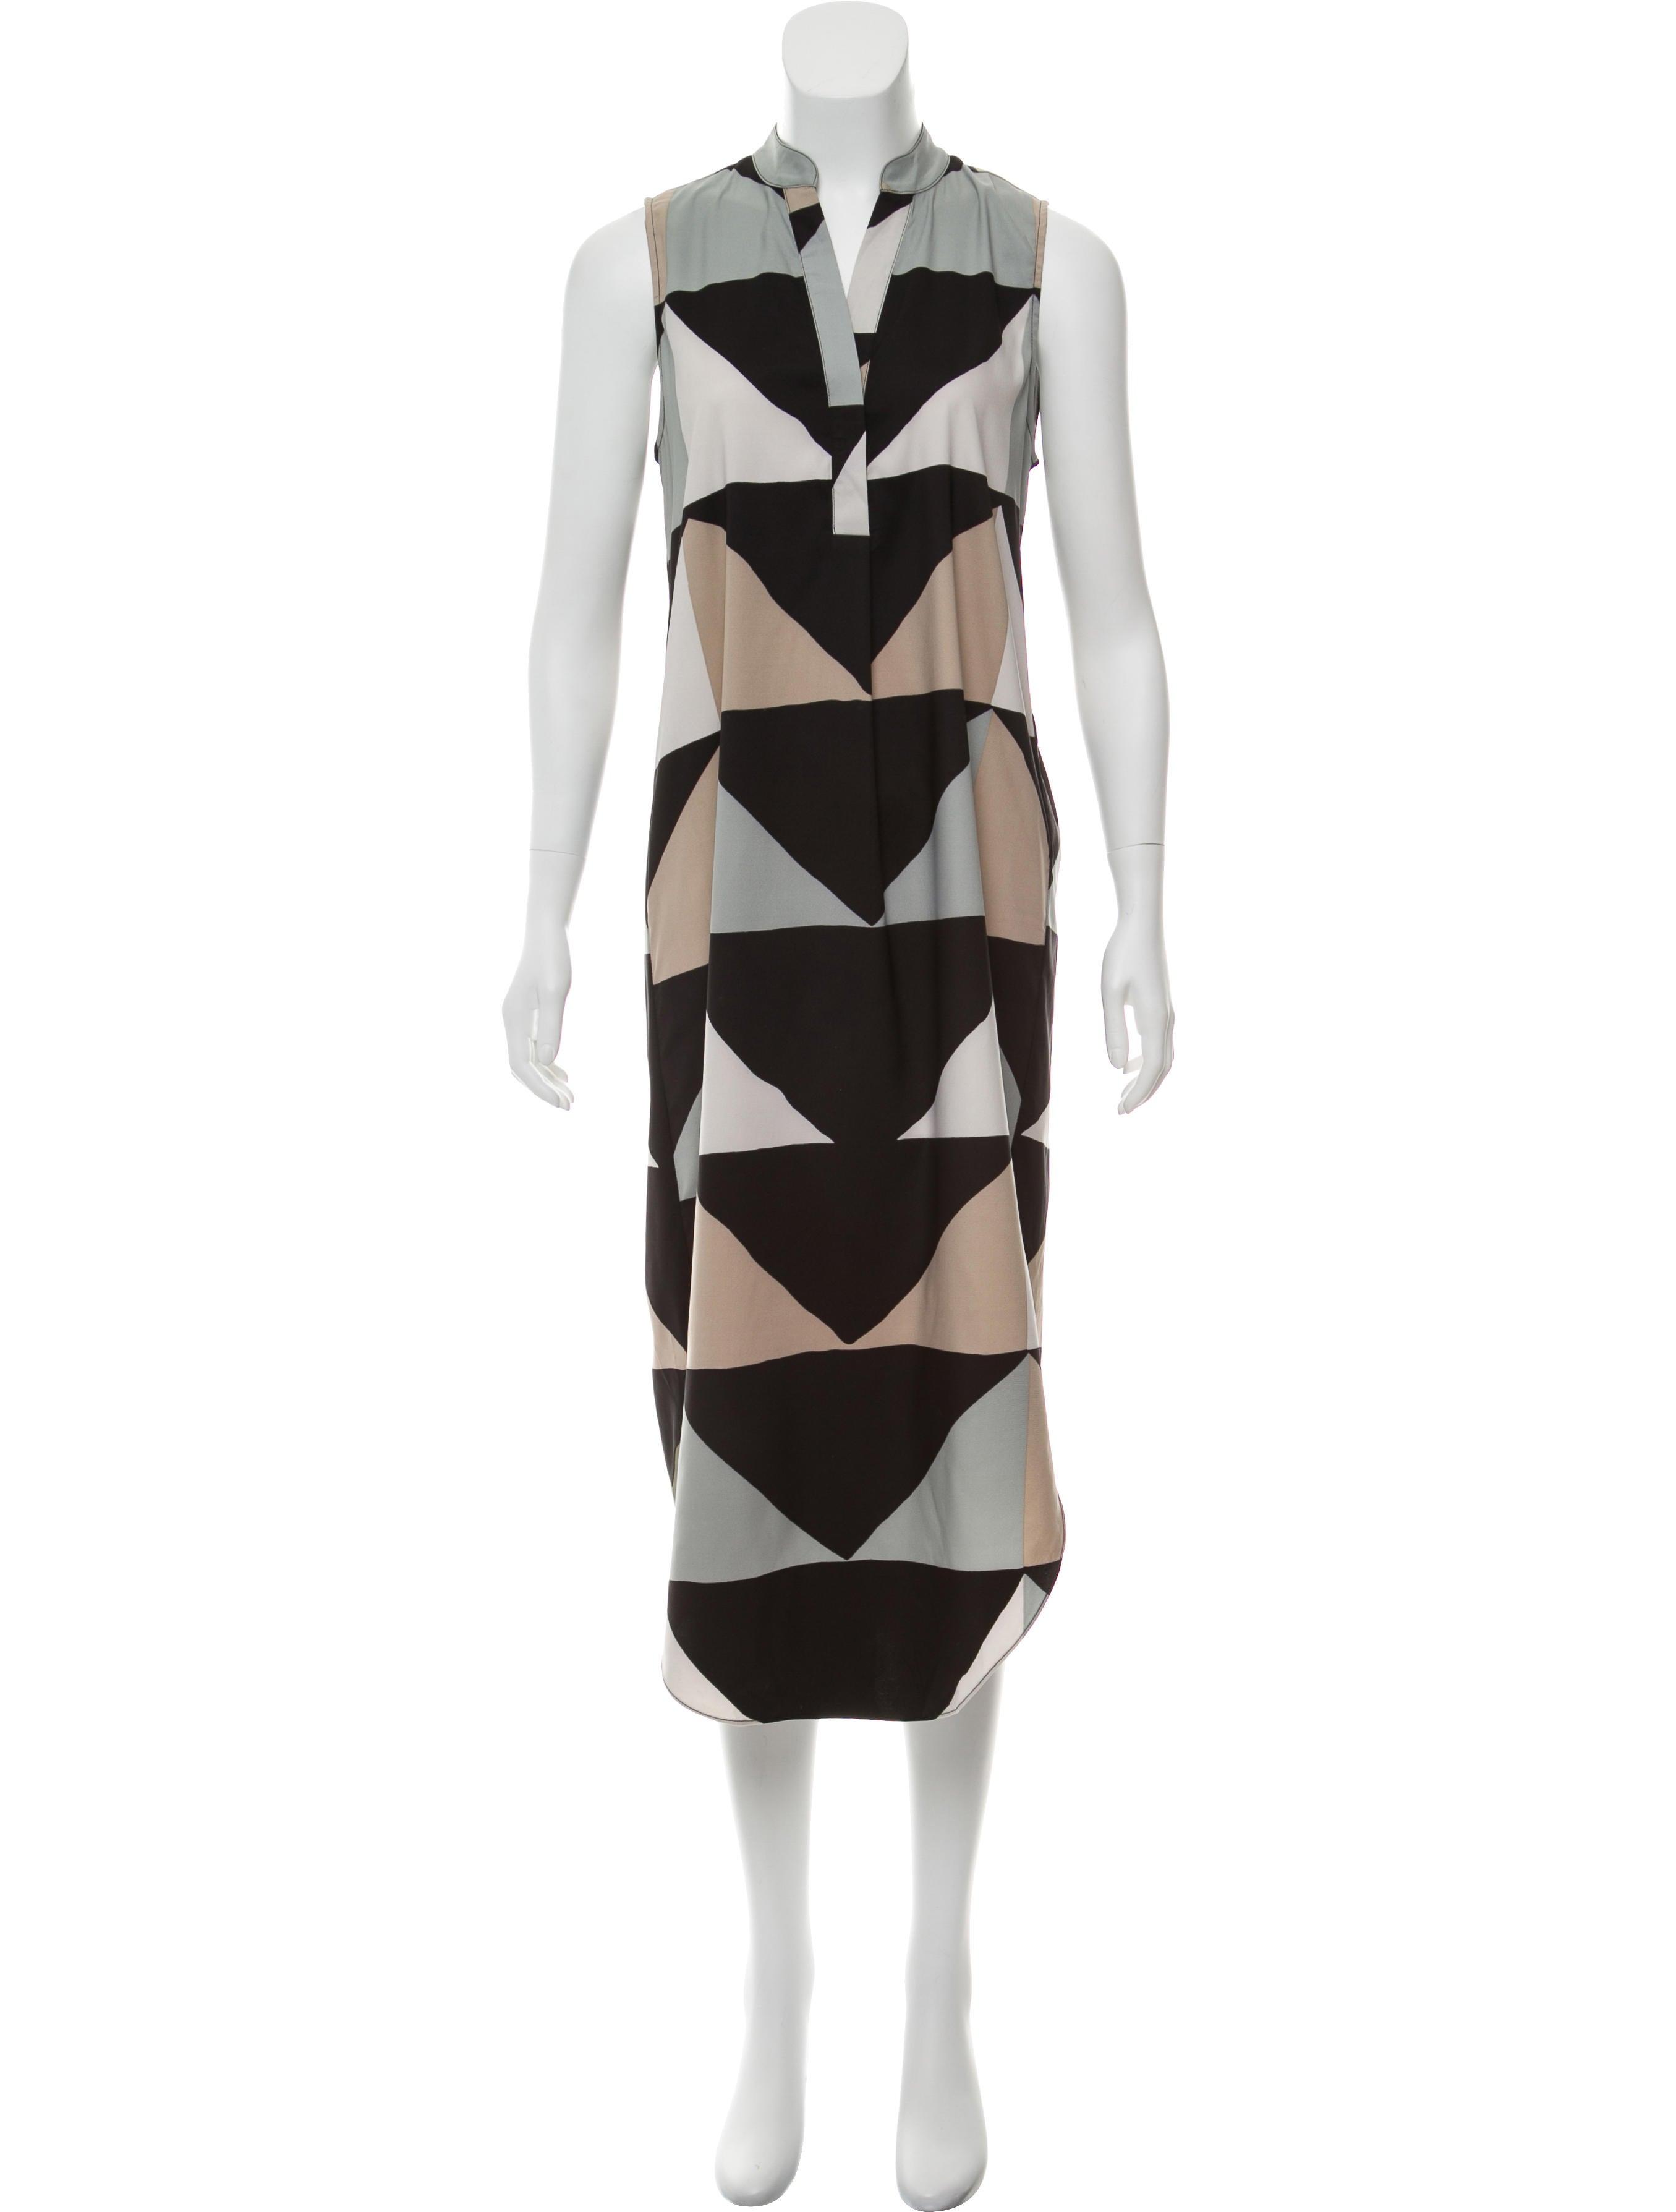 89ff86be155 Mara Hoffman Geometric Midi Dress - Clothing - WHX27546